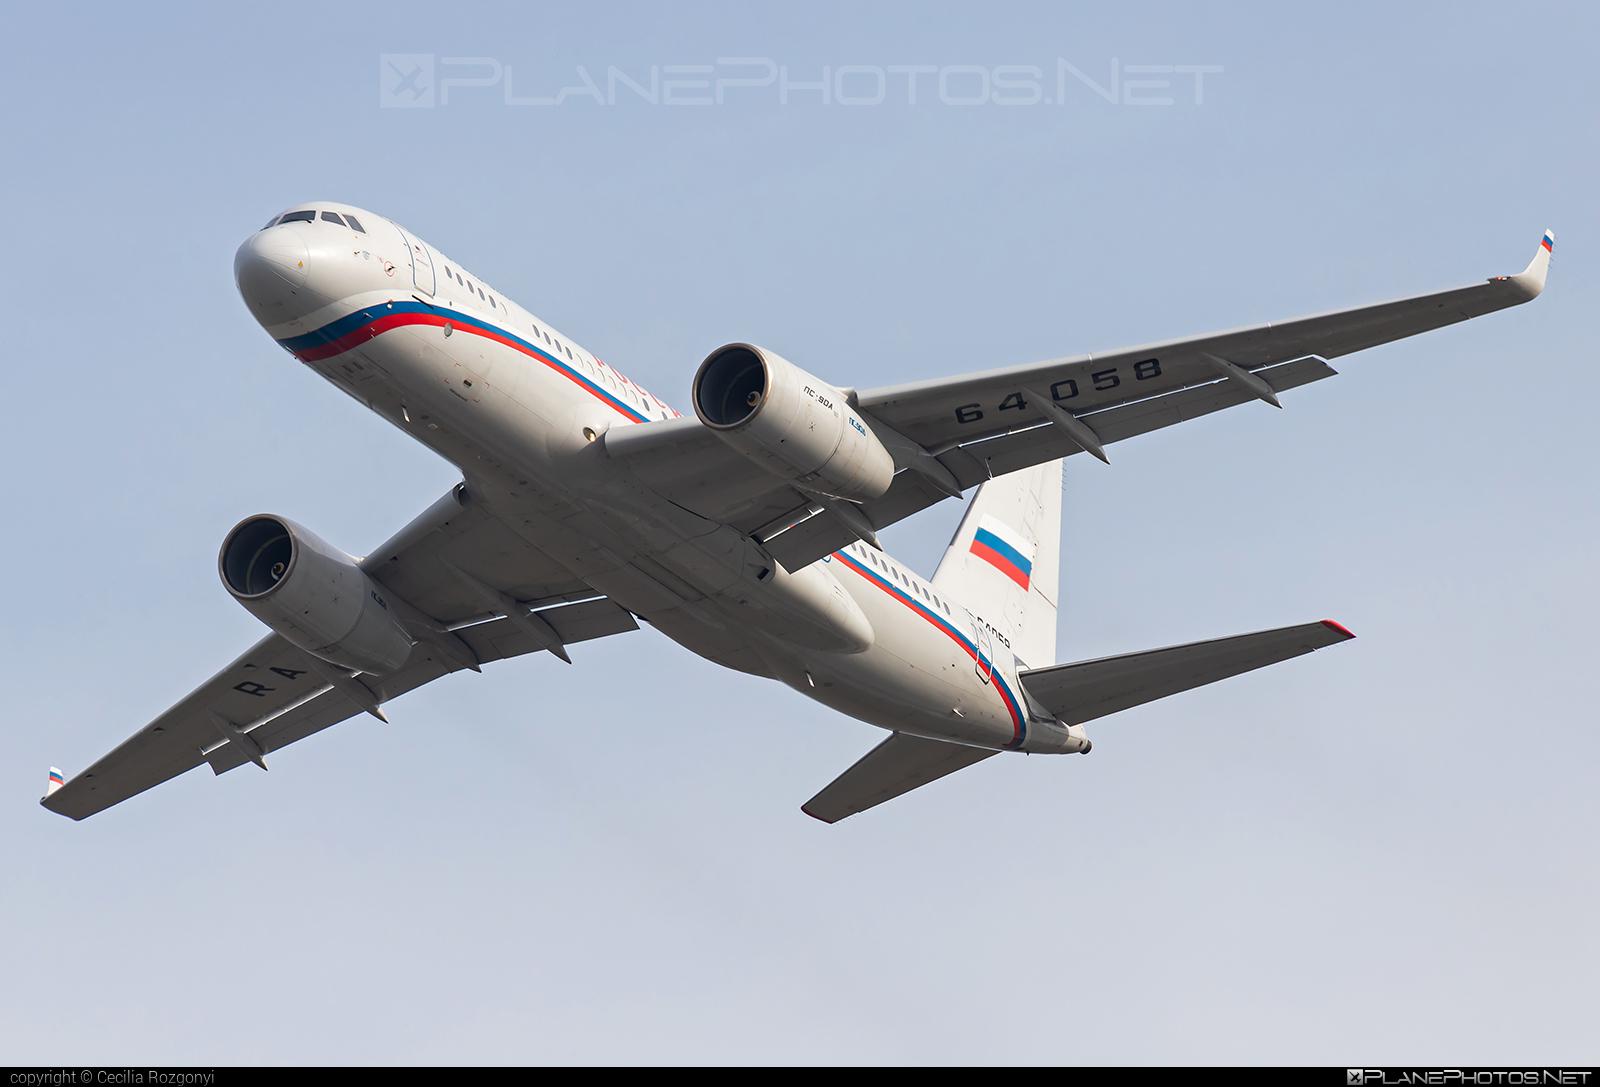 Tupolev Tu-204-300 - RA-64058 operated by Russia - Department of the Defense #tu204 #tu204300 #tupolev